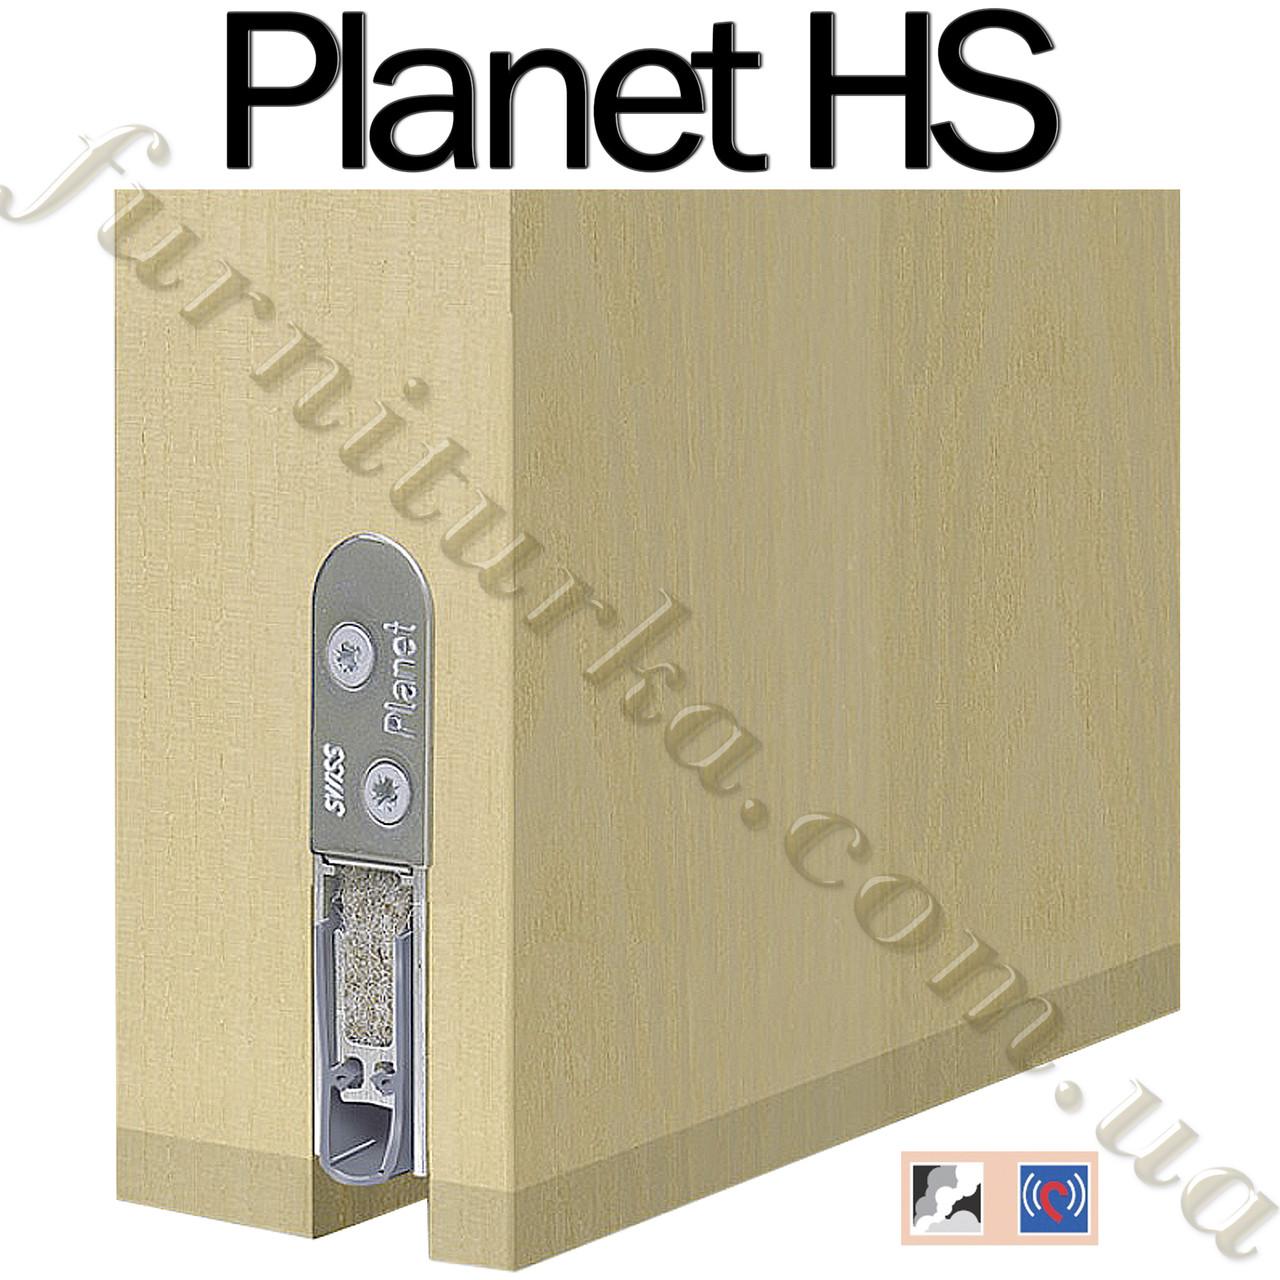 Самоопускающийся порог Planet HS 835 мм